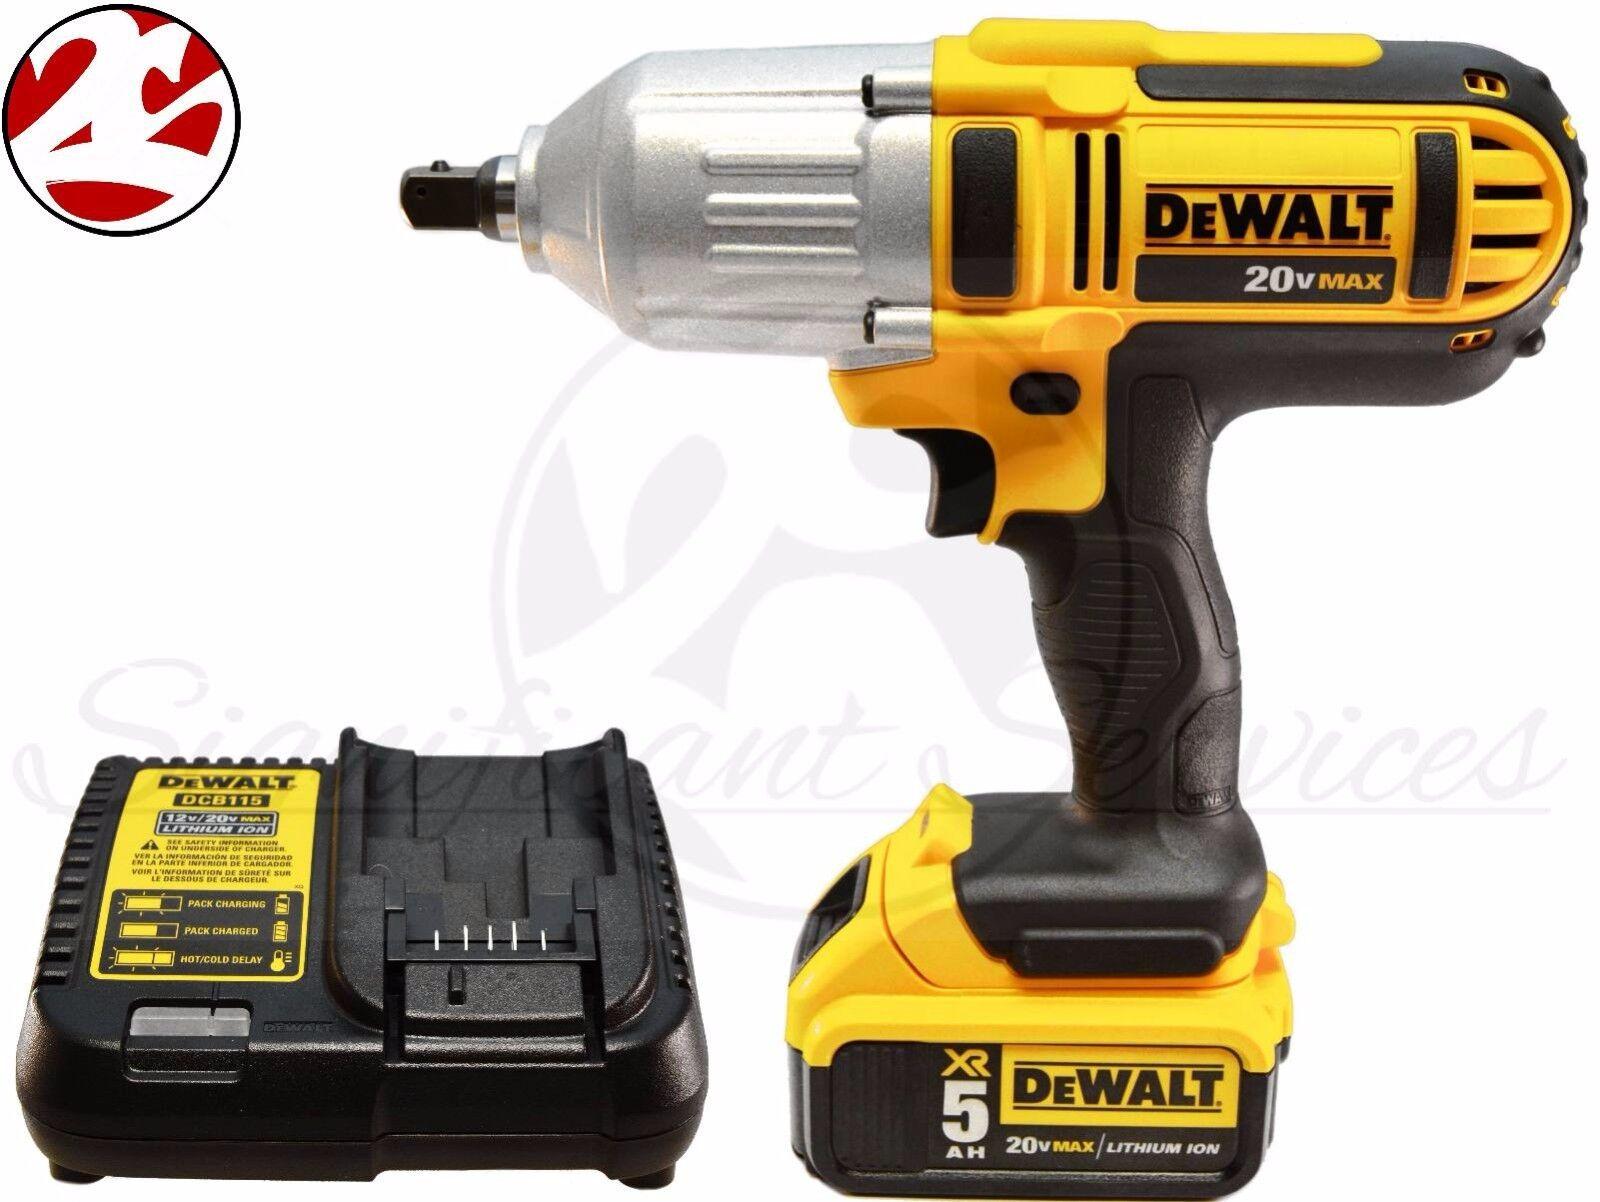 New DeWALT DCF889M2 20V MAX Lithium Ion Cordless 5.0 Ah 1/2